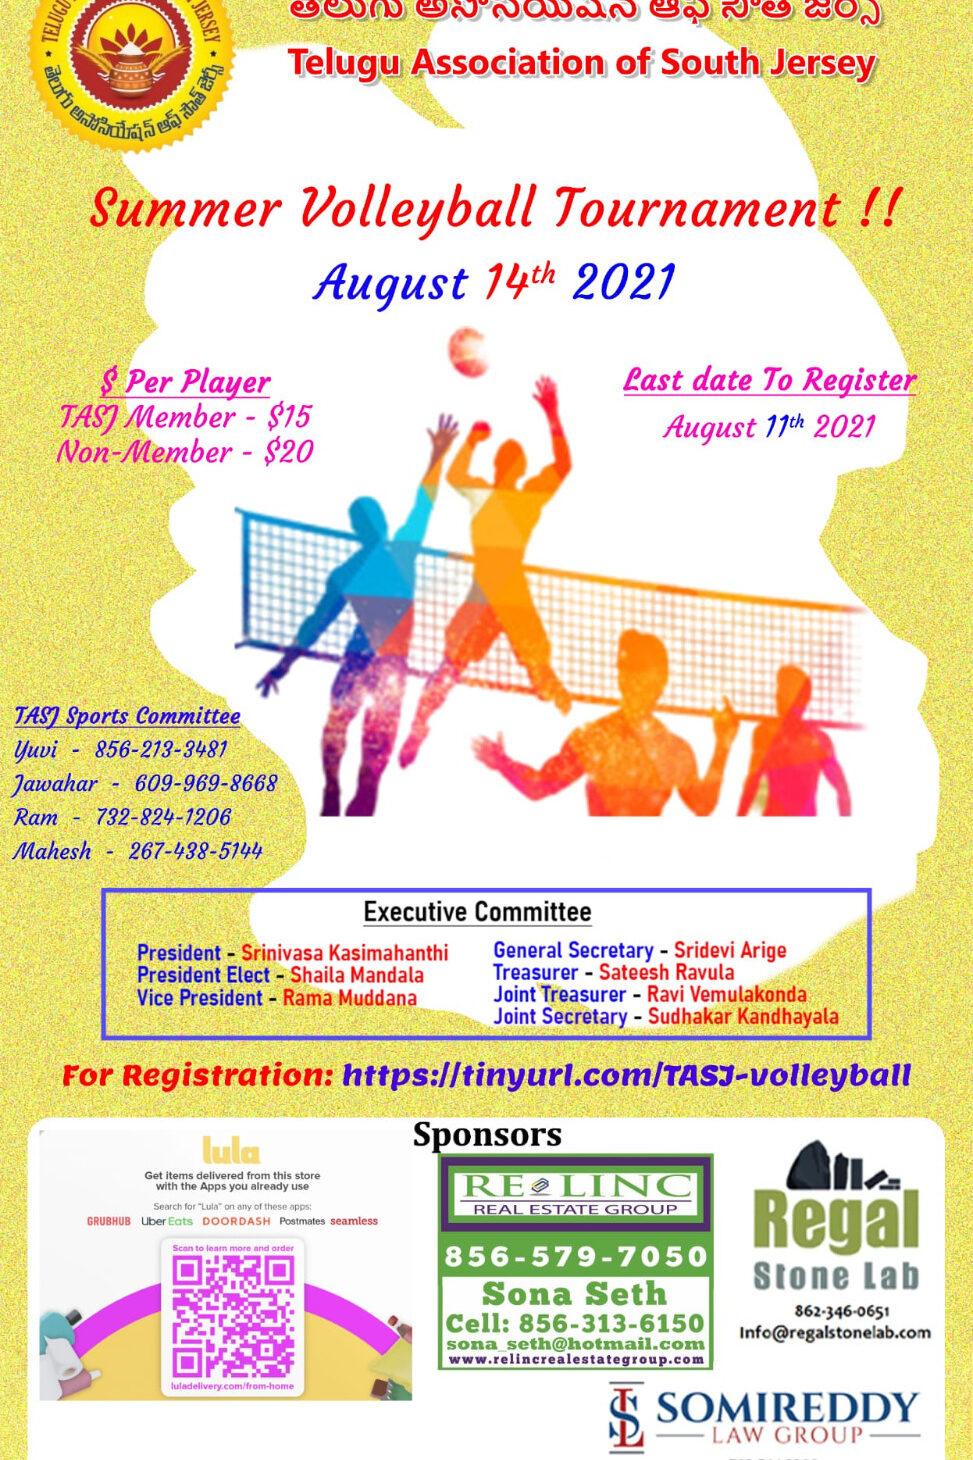 Tasj-2021-Volleyball-Tournament_orig